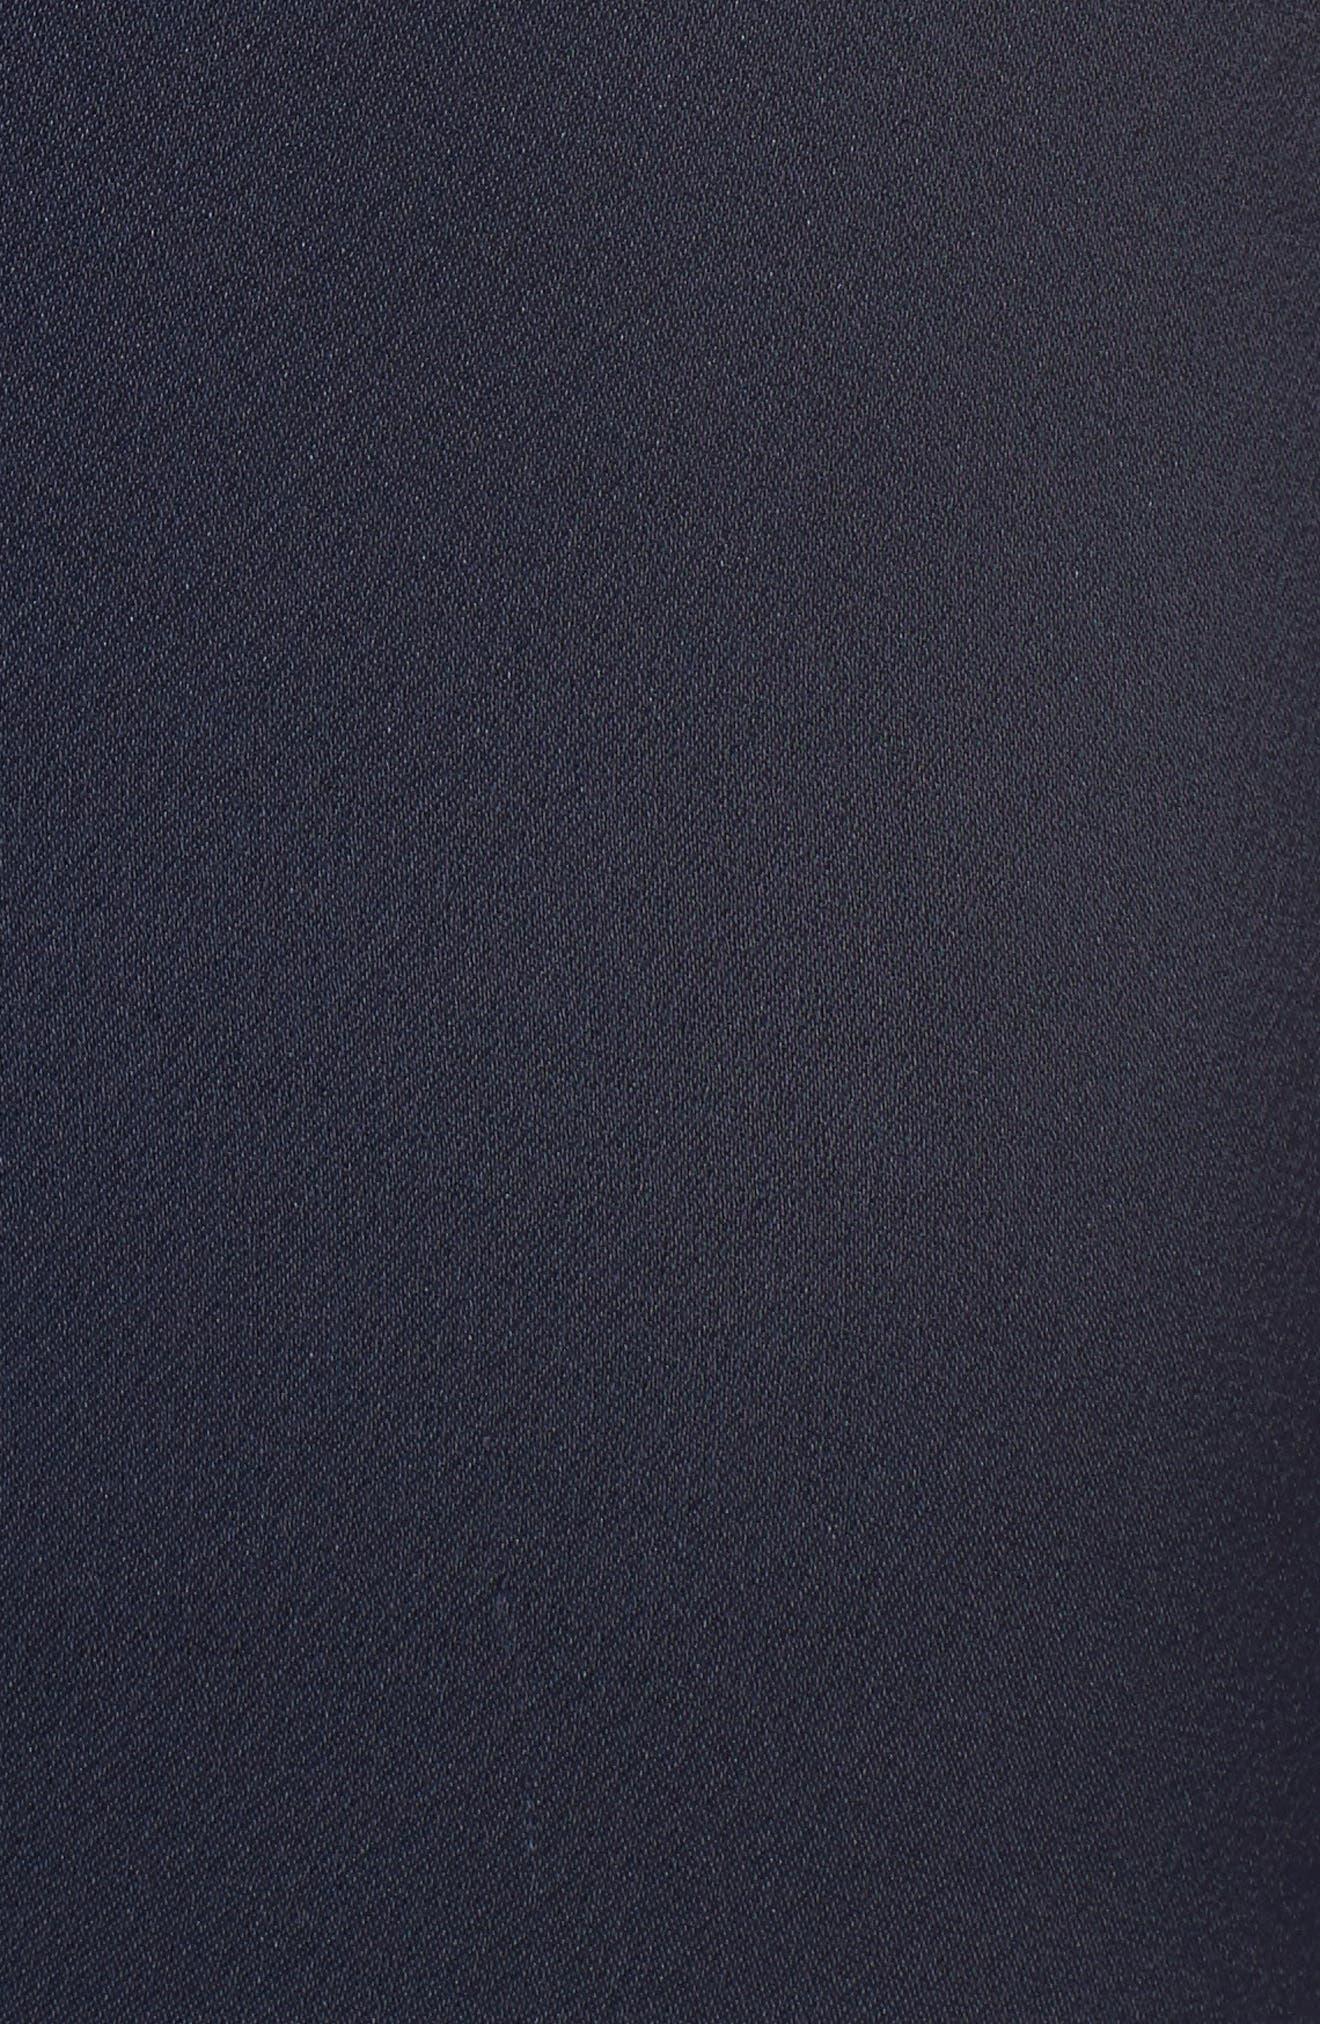 Ruffle Detail Crepe Jumpsuit,                             Alternate thumbnail 6, color,                             Navy